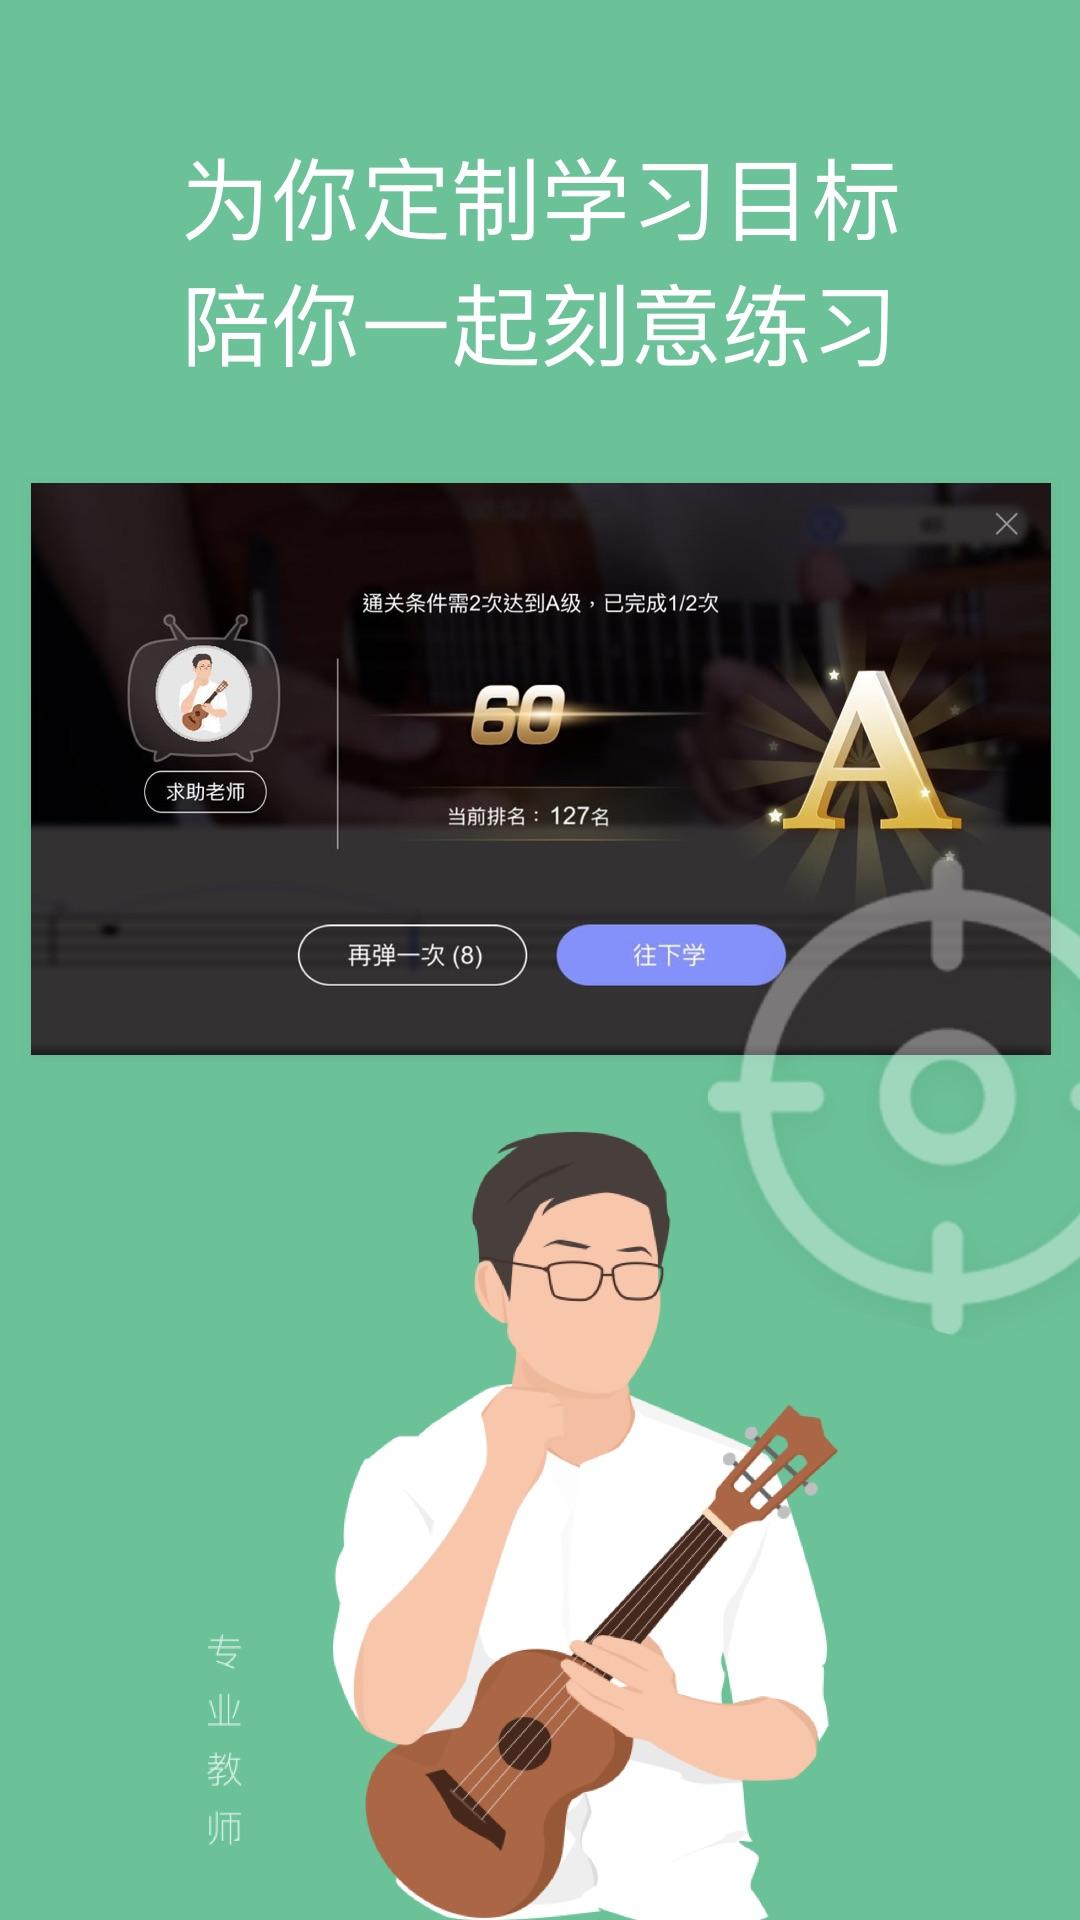 AI音乐学院截图